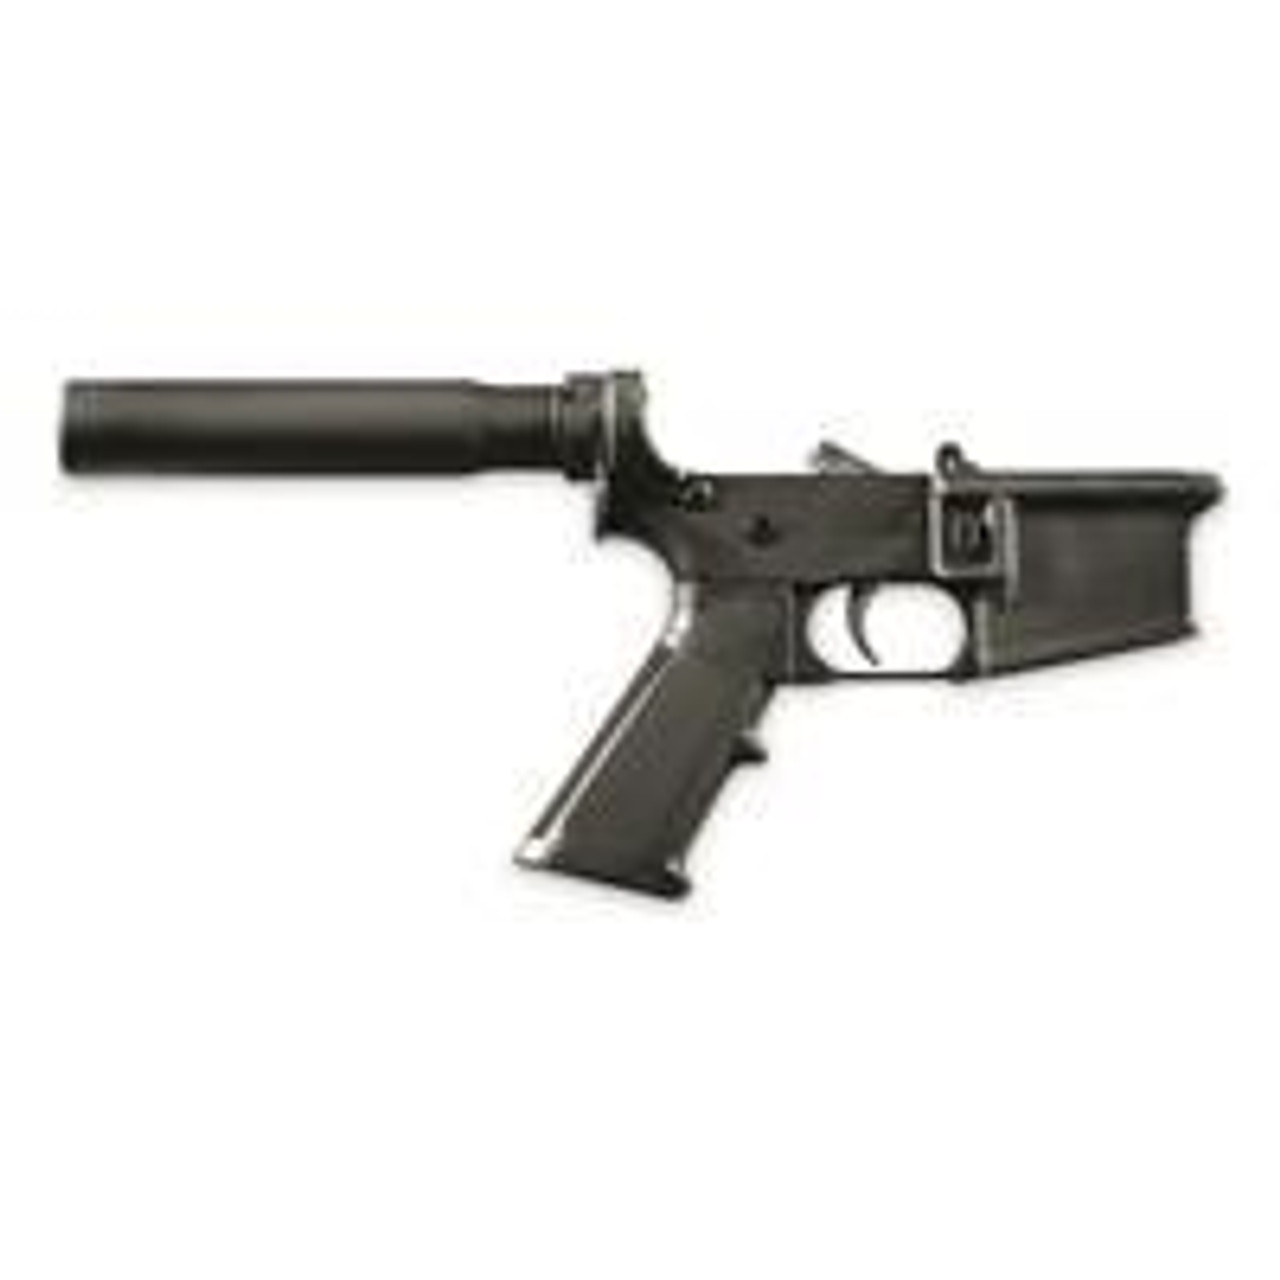 Anderson Complete AR-15 Pistol Lower Receiver Black B2-K403-0000 NIB